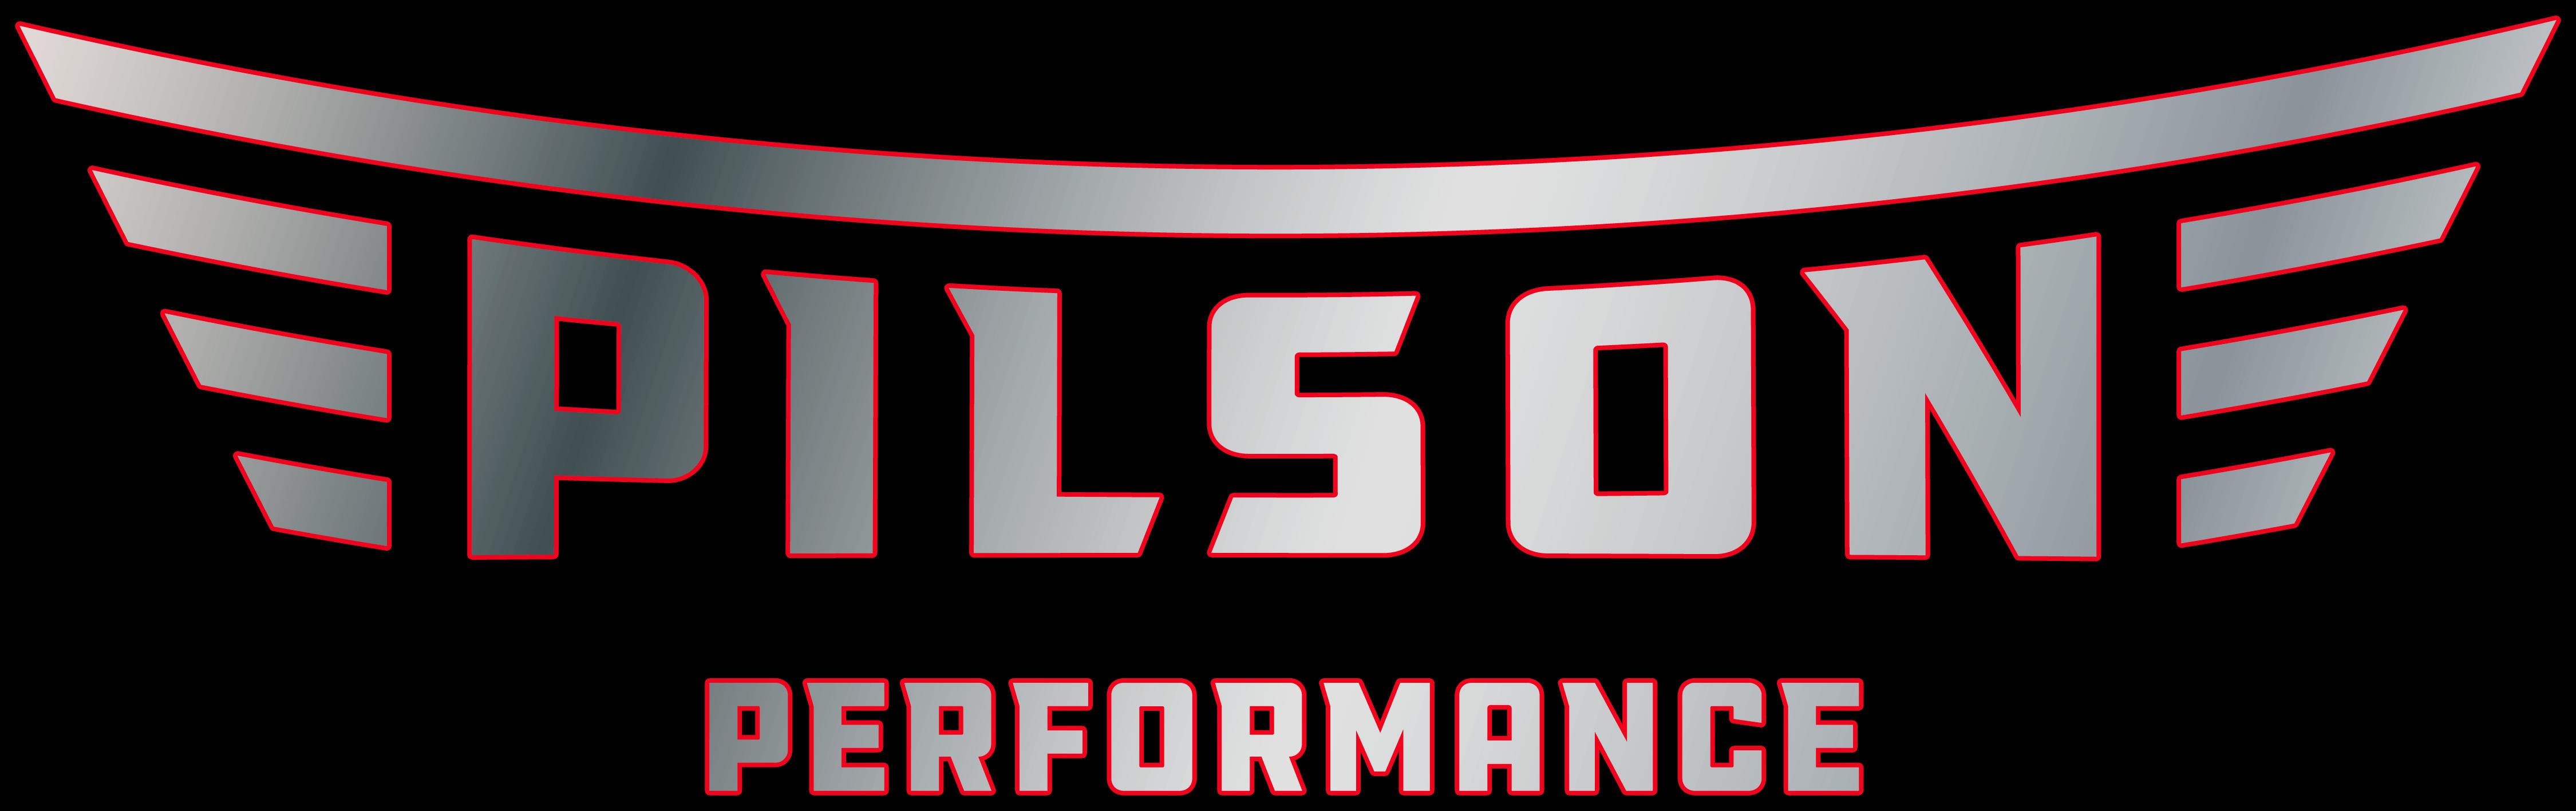 pilson performance logo